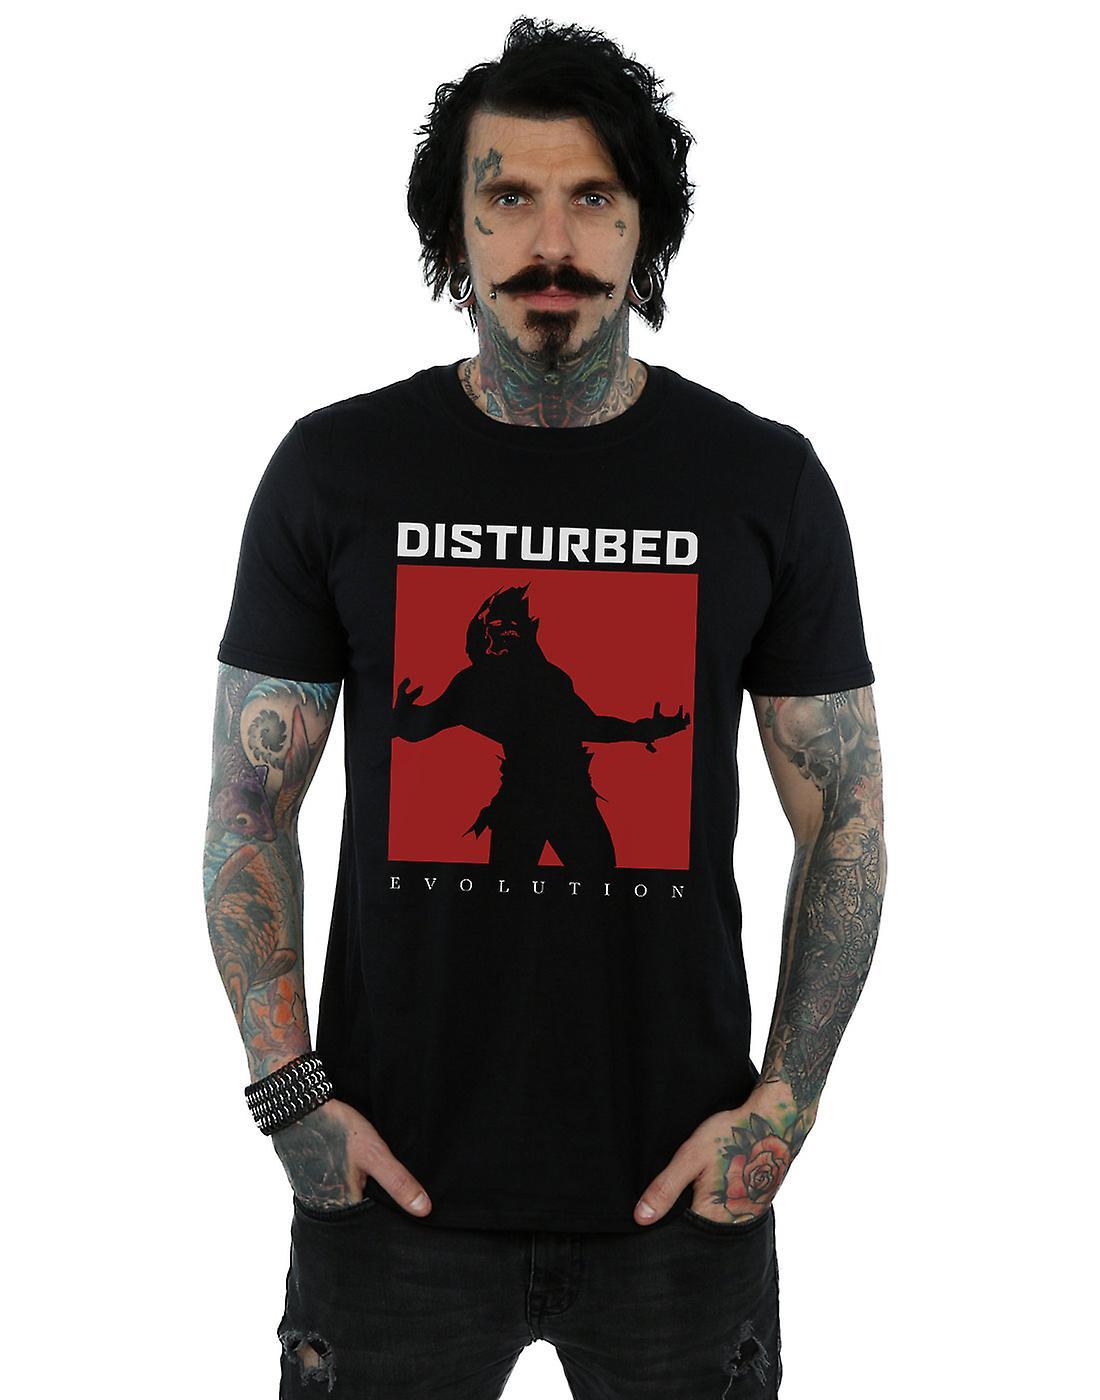 Disturbed Men's Evolution Square T-Shirt